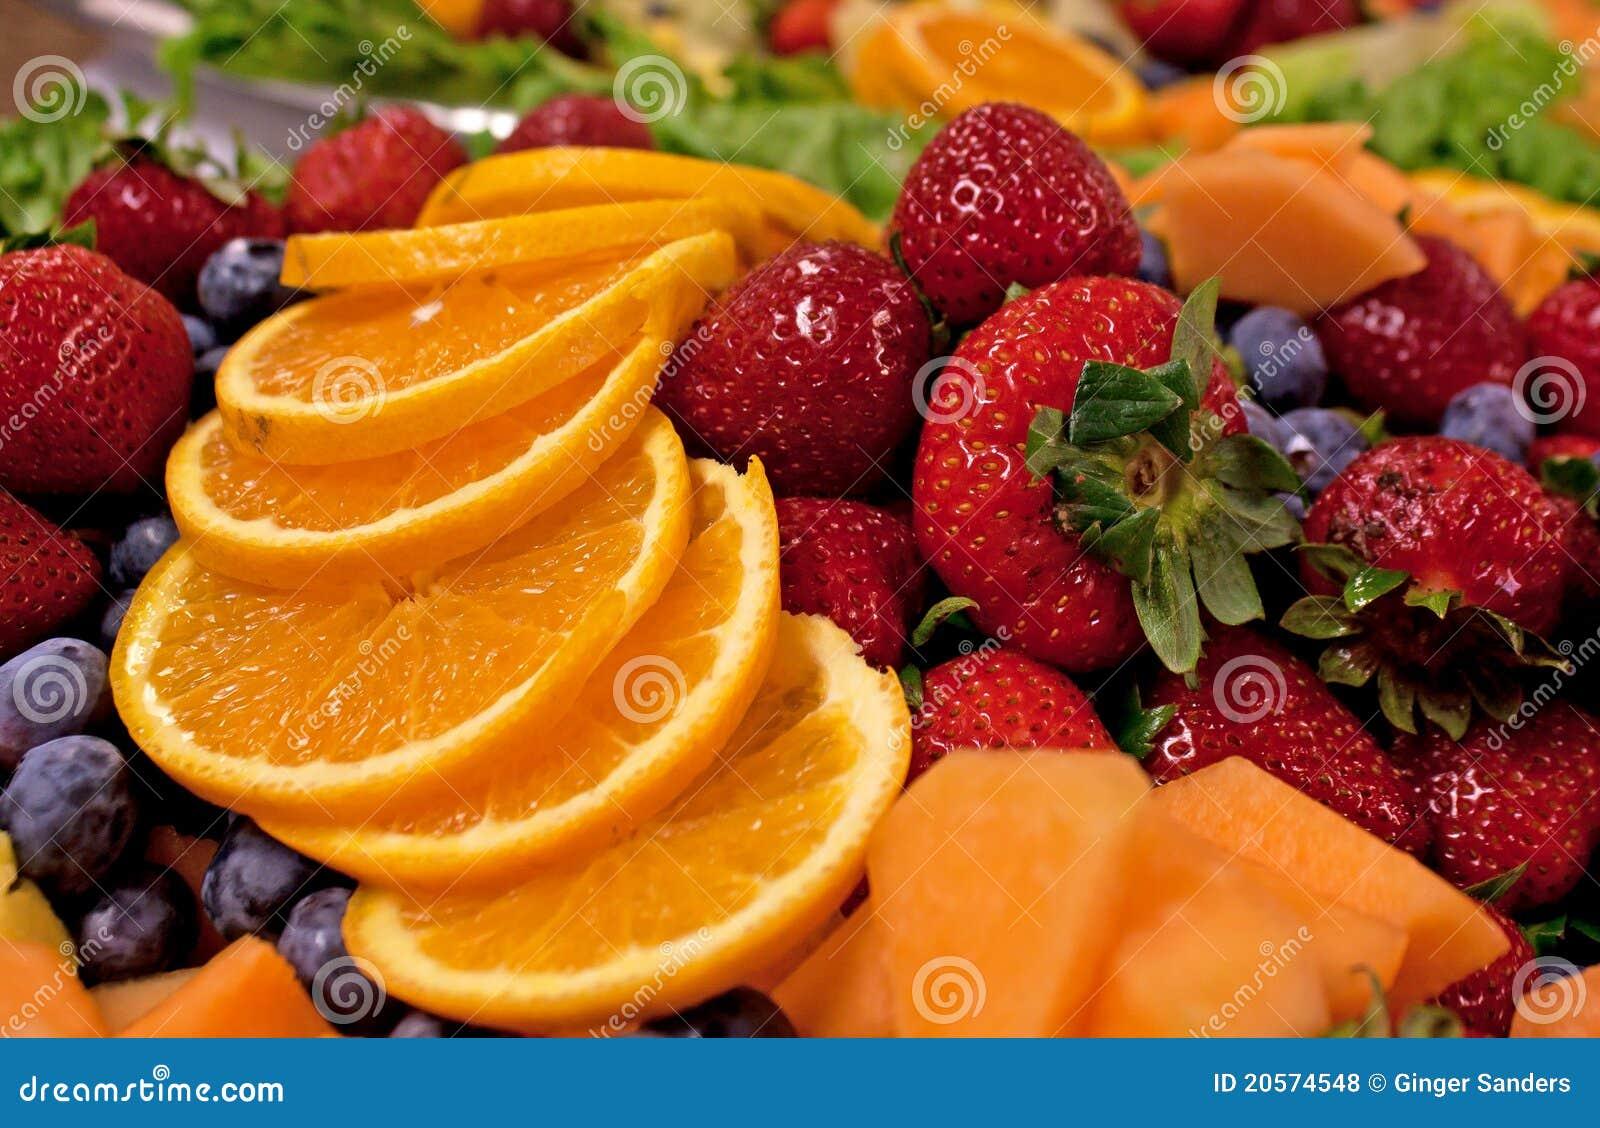 Bright Yummy Mixed Fruit Plate